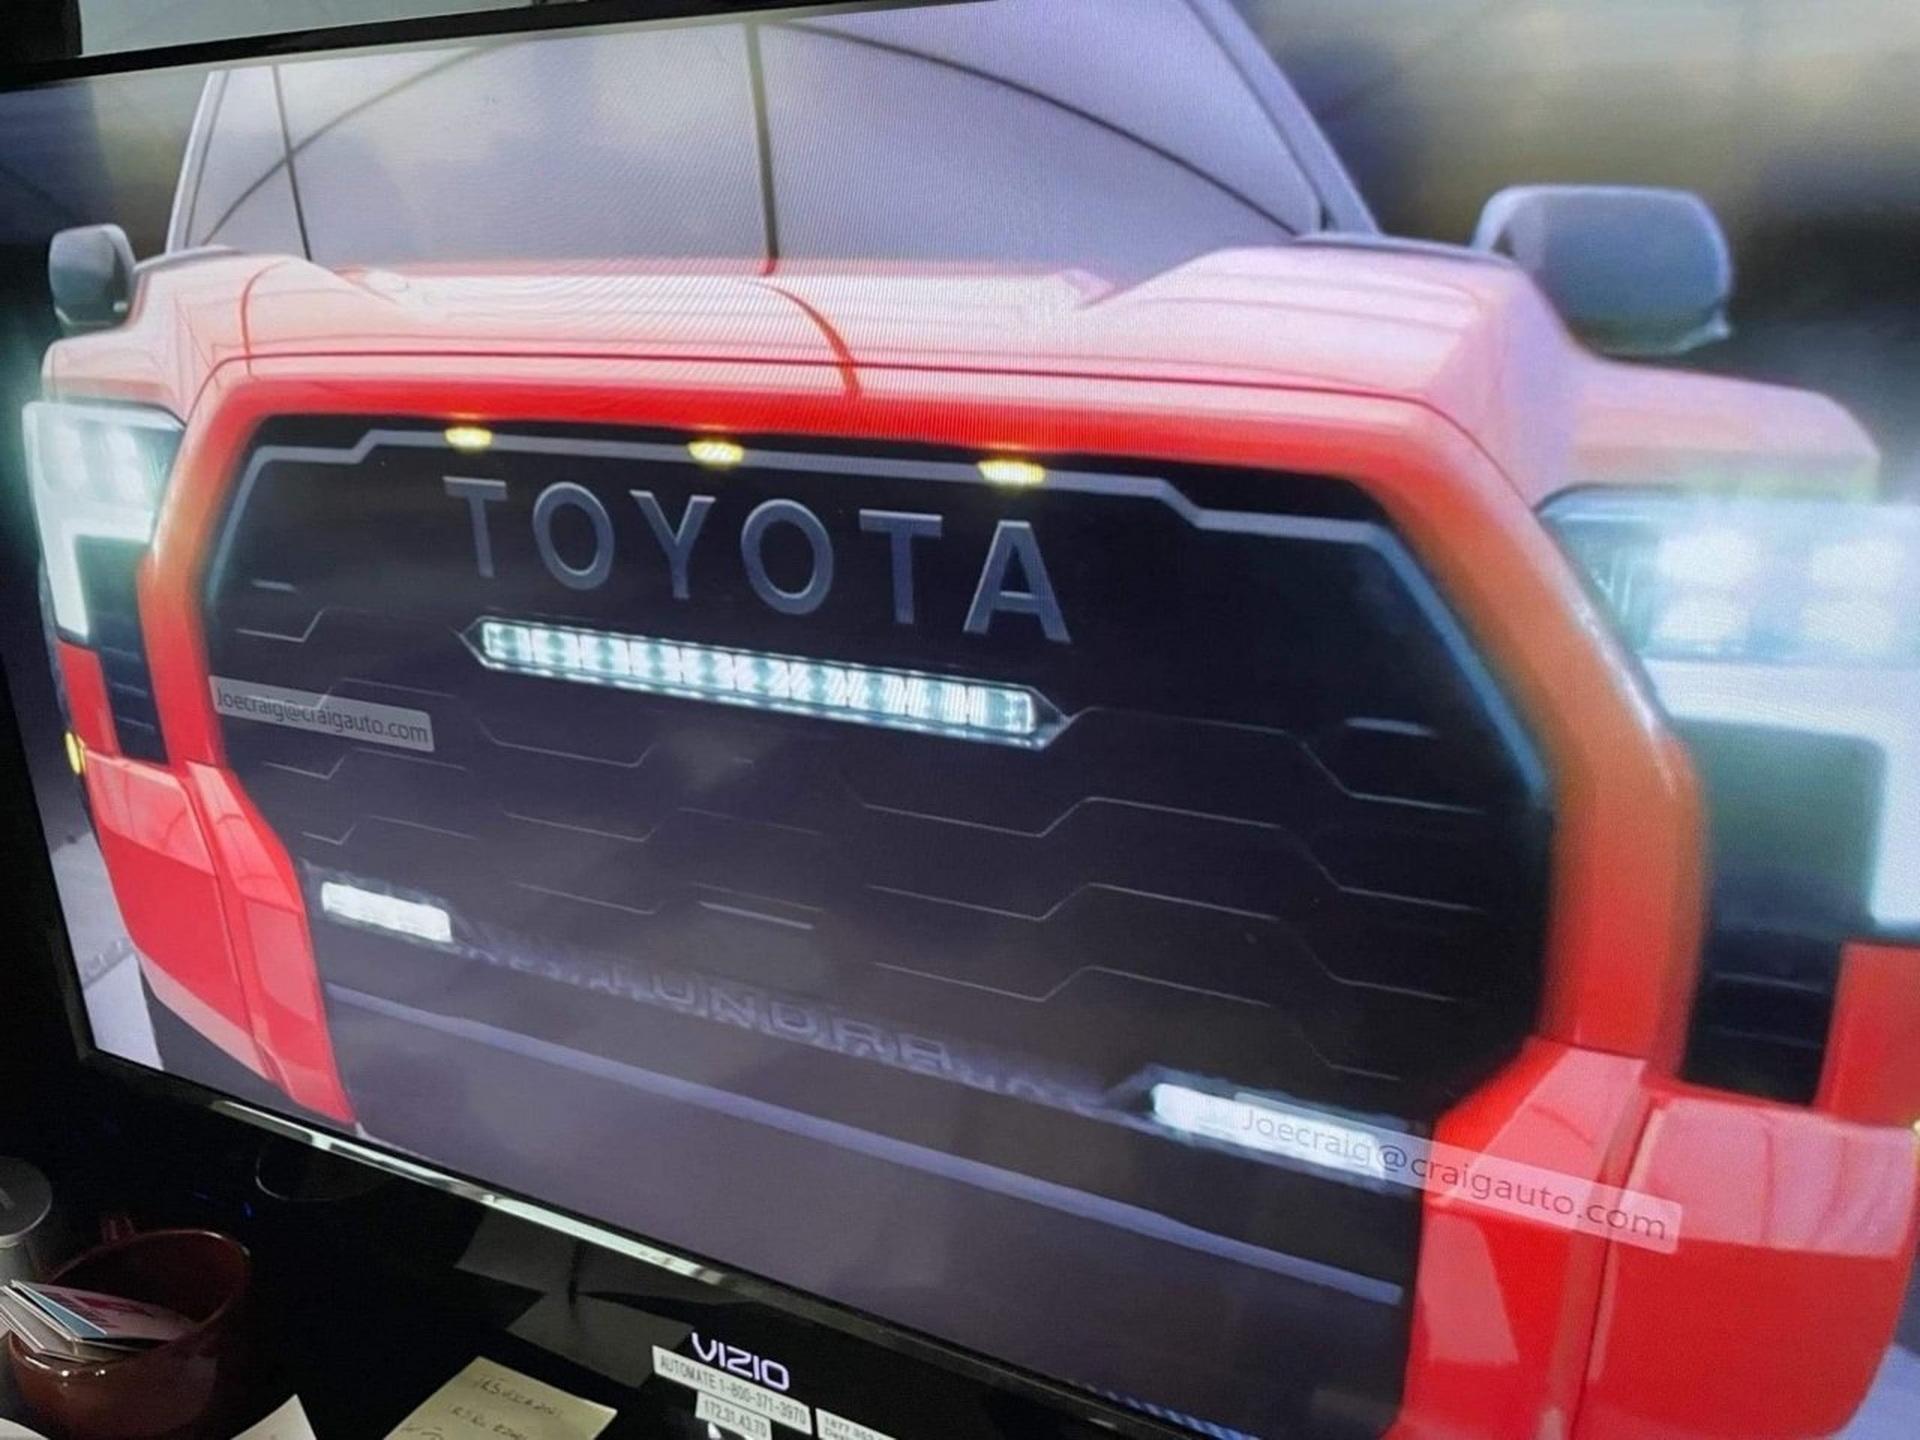 تويوتا تندرا تراد برو 2022